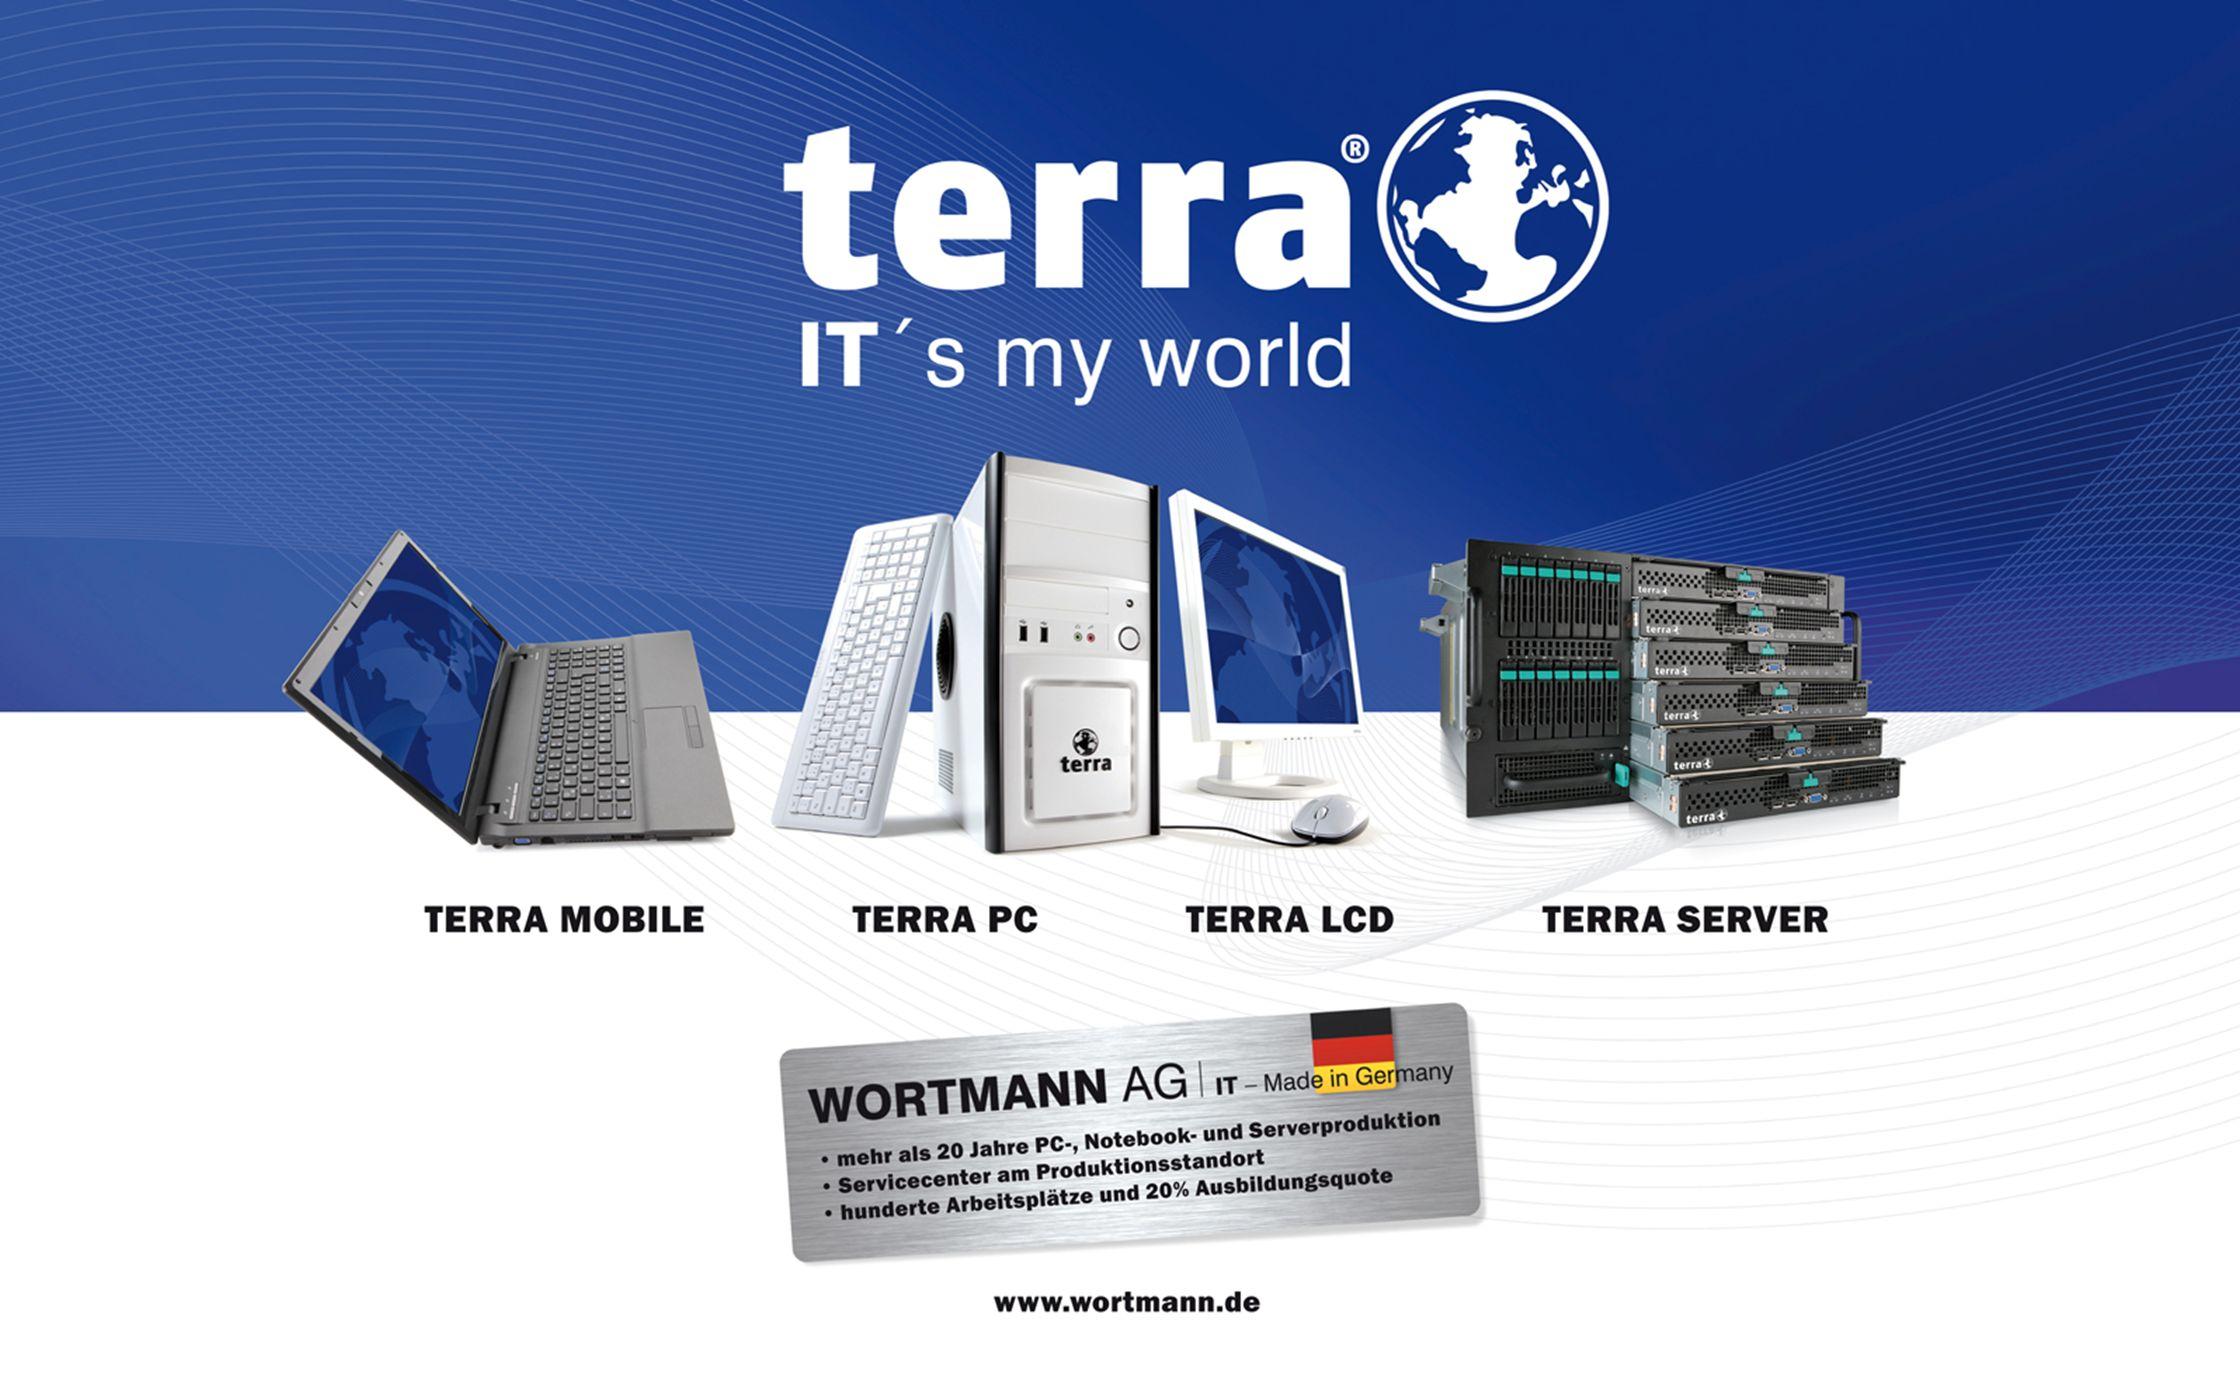 www.wortmann.de » Small Office/Filliale » Small Business » Medium Business » Enterprise TERRA FIREWALL Der IT-Security-Alleskönner MOBILE PC LCD SERVER STORAGE FIREWALL THINCLIENT SERVICE